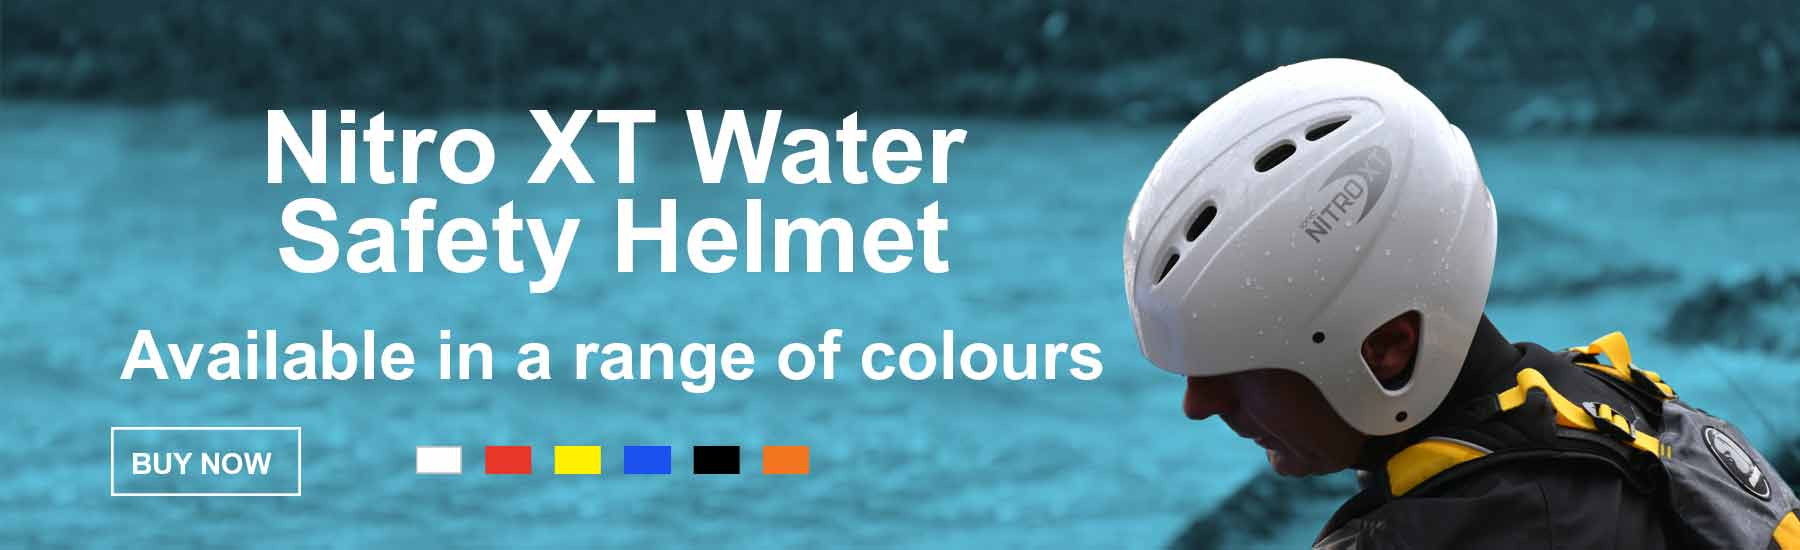 Ionic Nitro XT Water Helmet